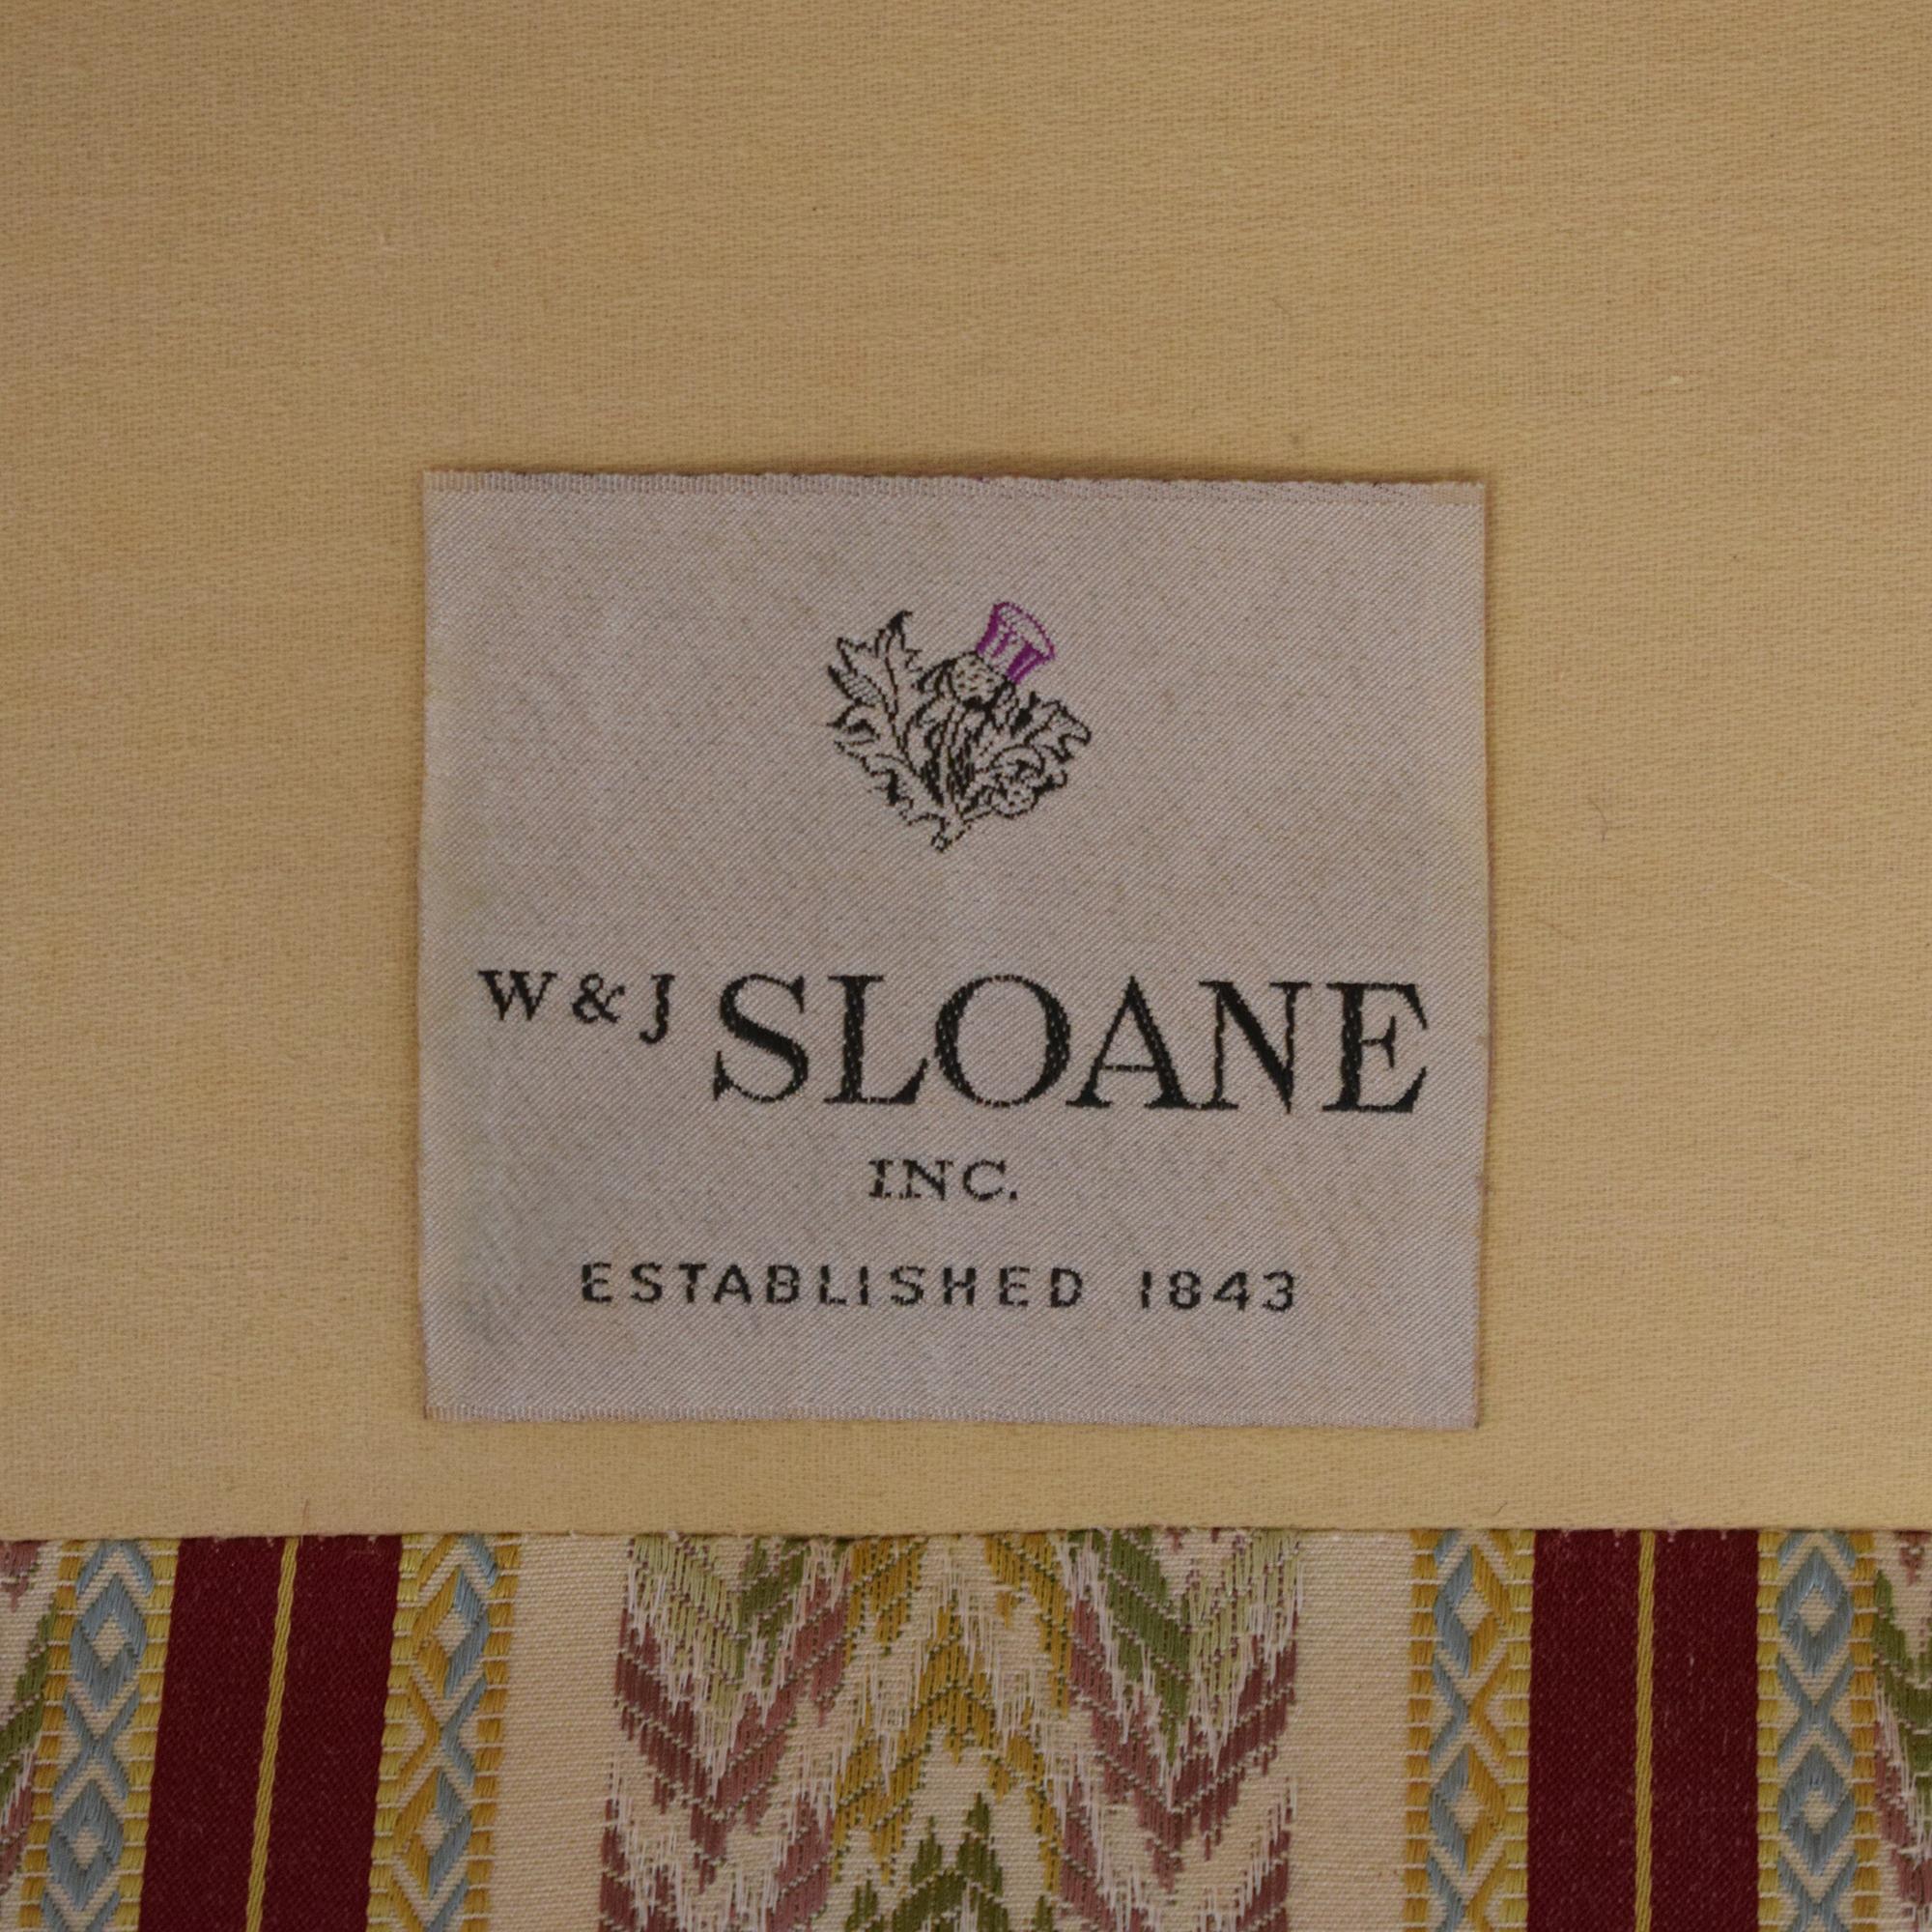 W. & J. Sloane W & J Sloane Single Cushion Sofa second hand